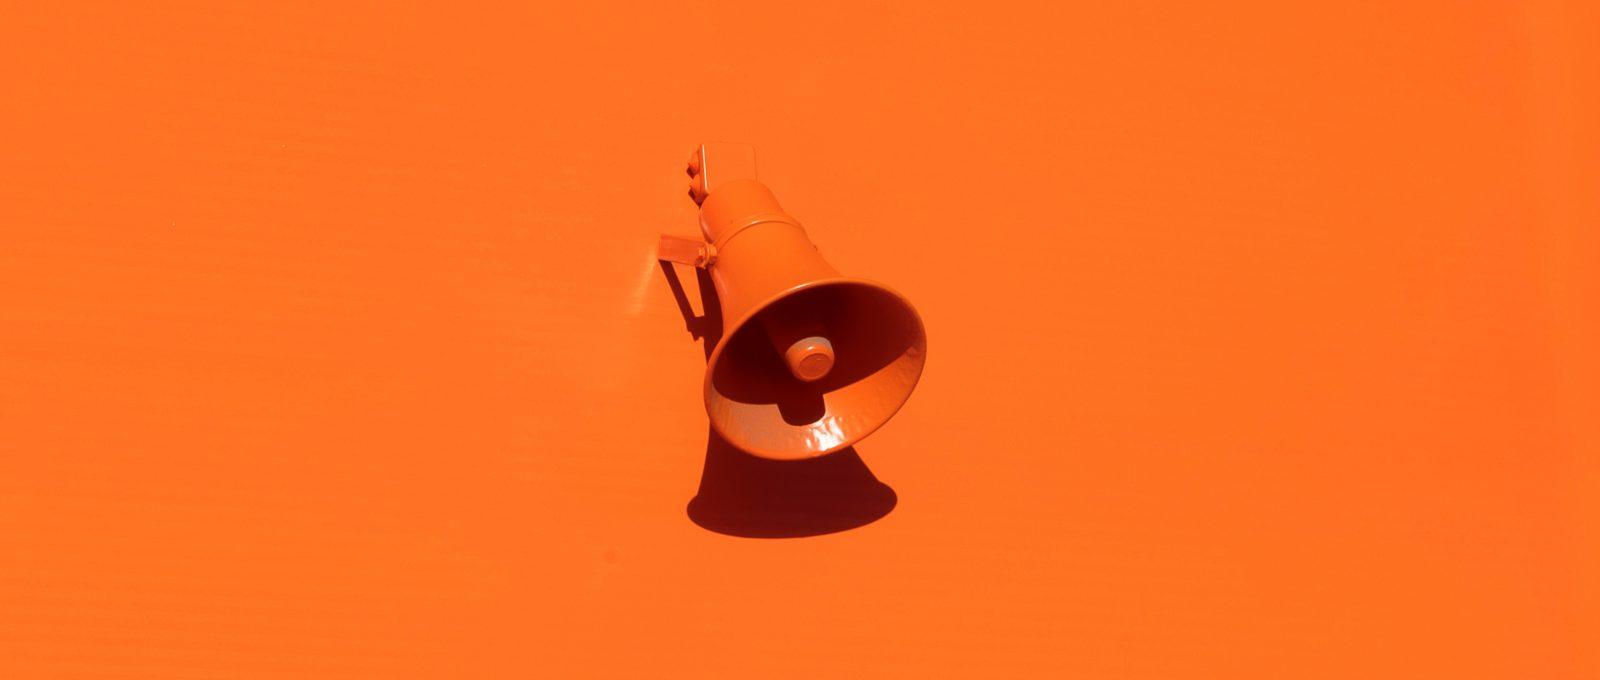 Orange microphone on orange background